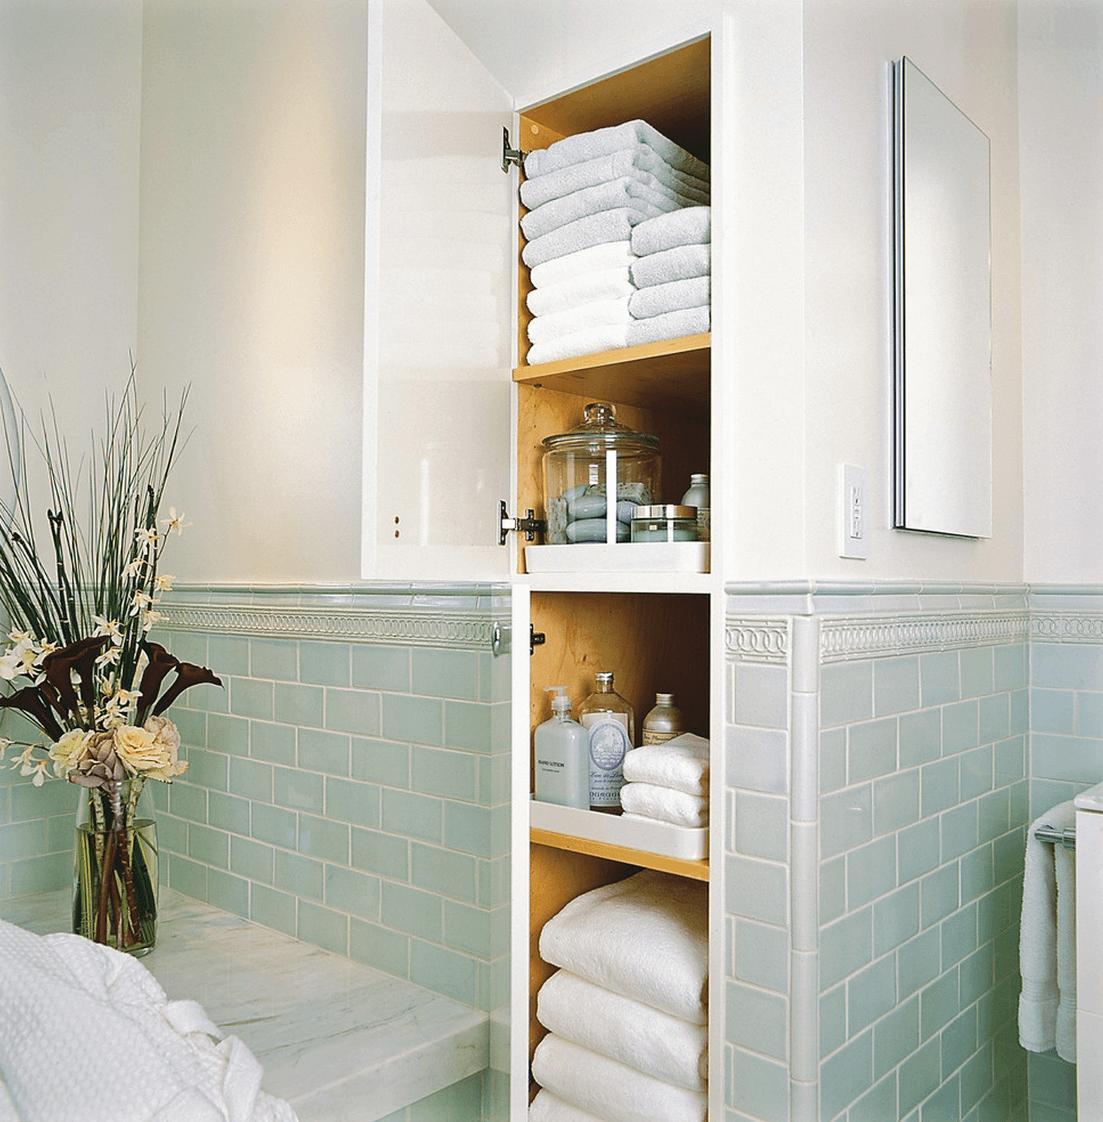 34-small-bathroom-storage-ideas-homebnc